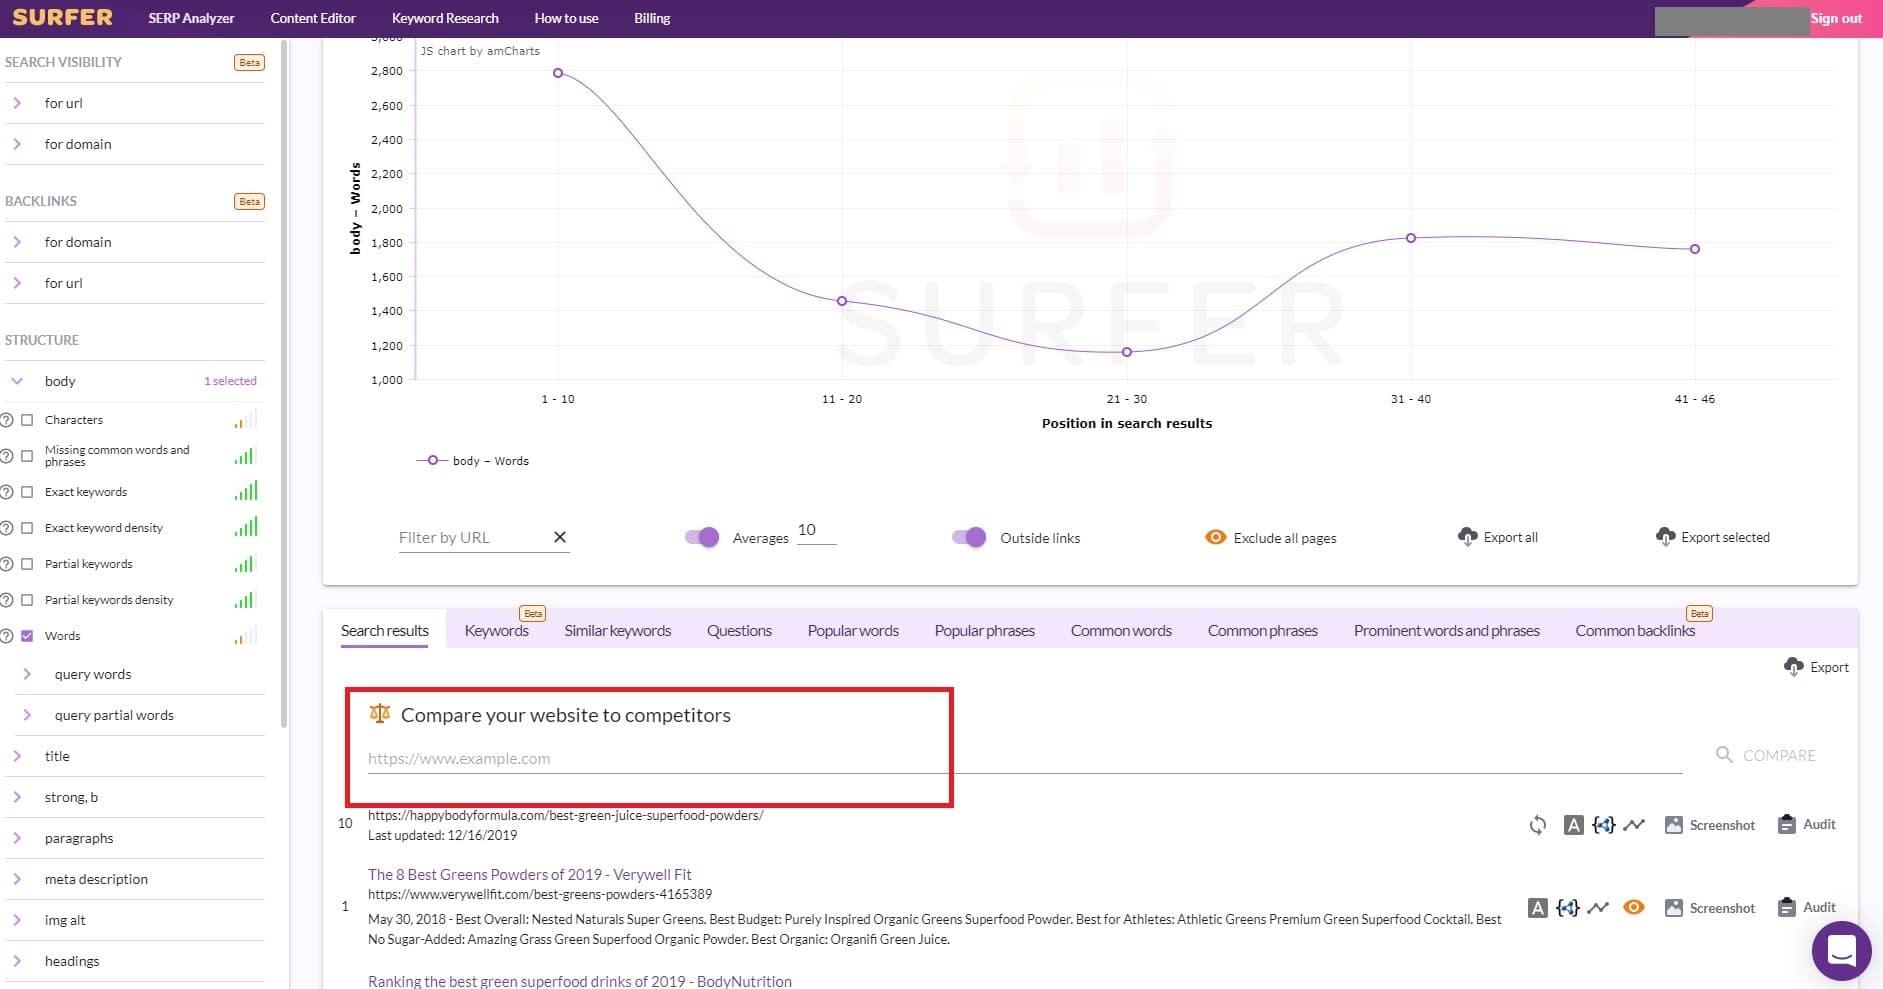 Compare website to competitors